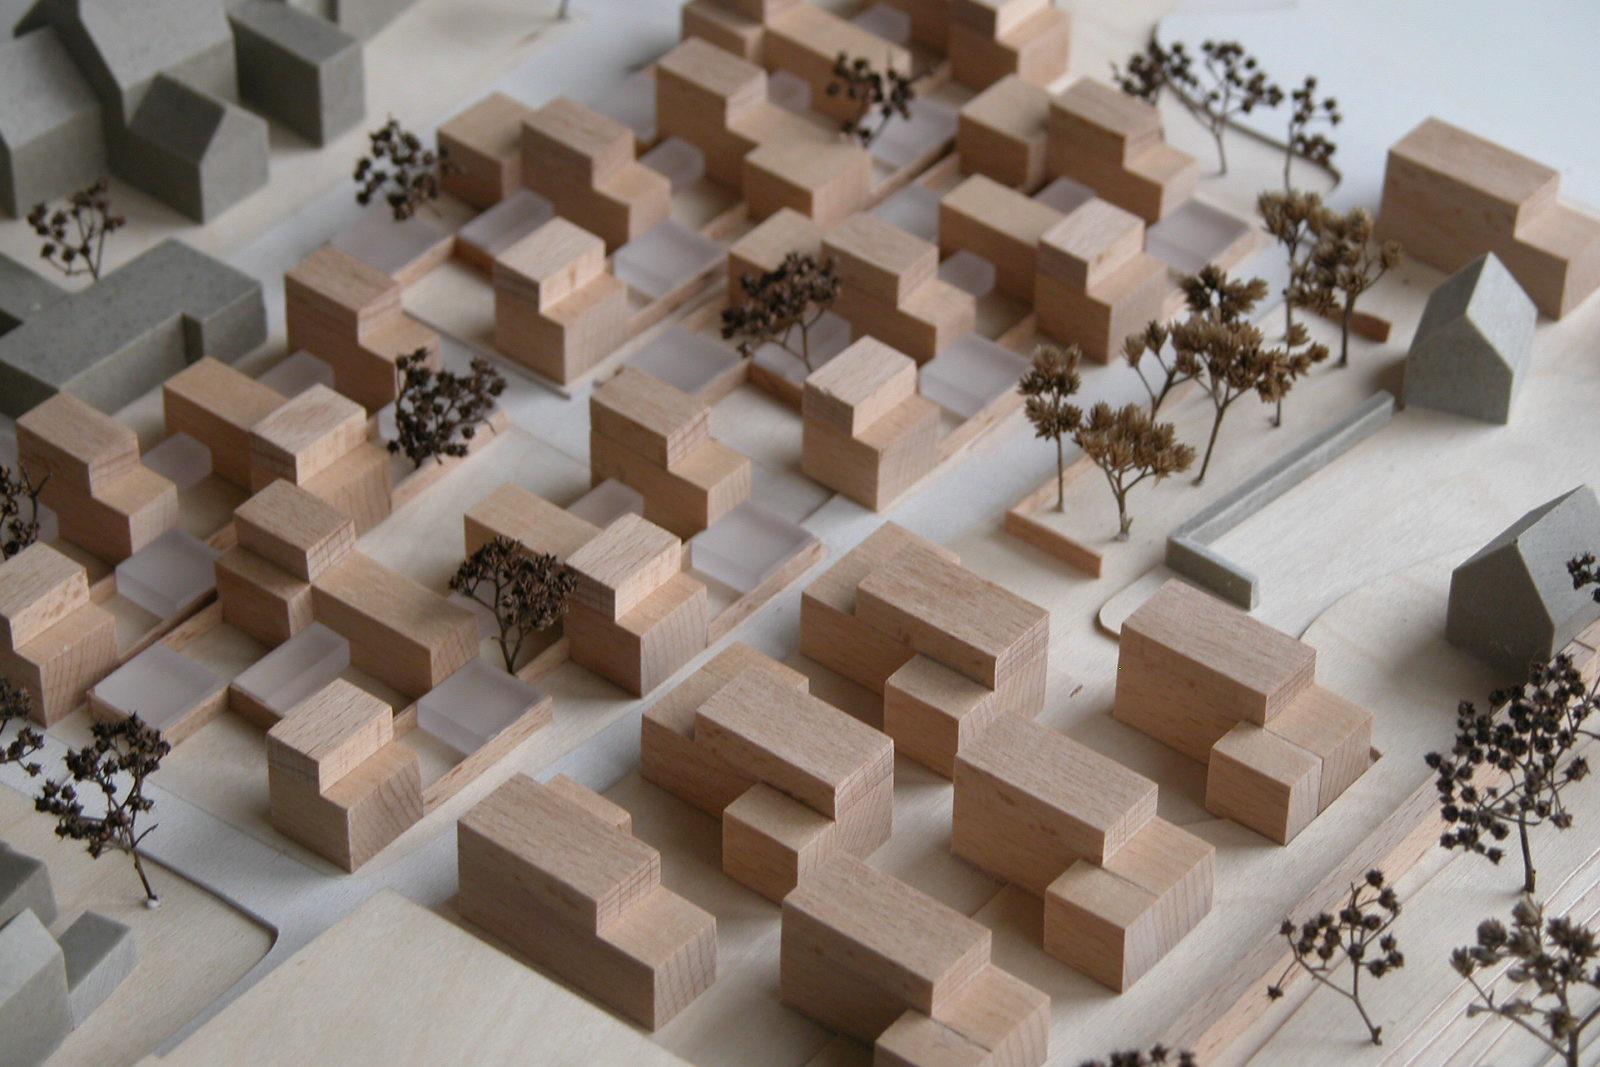 Wohnen an der Stadtmauer Bad Langensalza - Modell